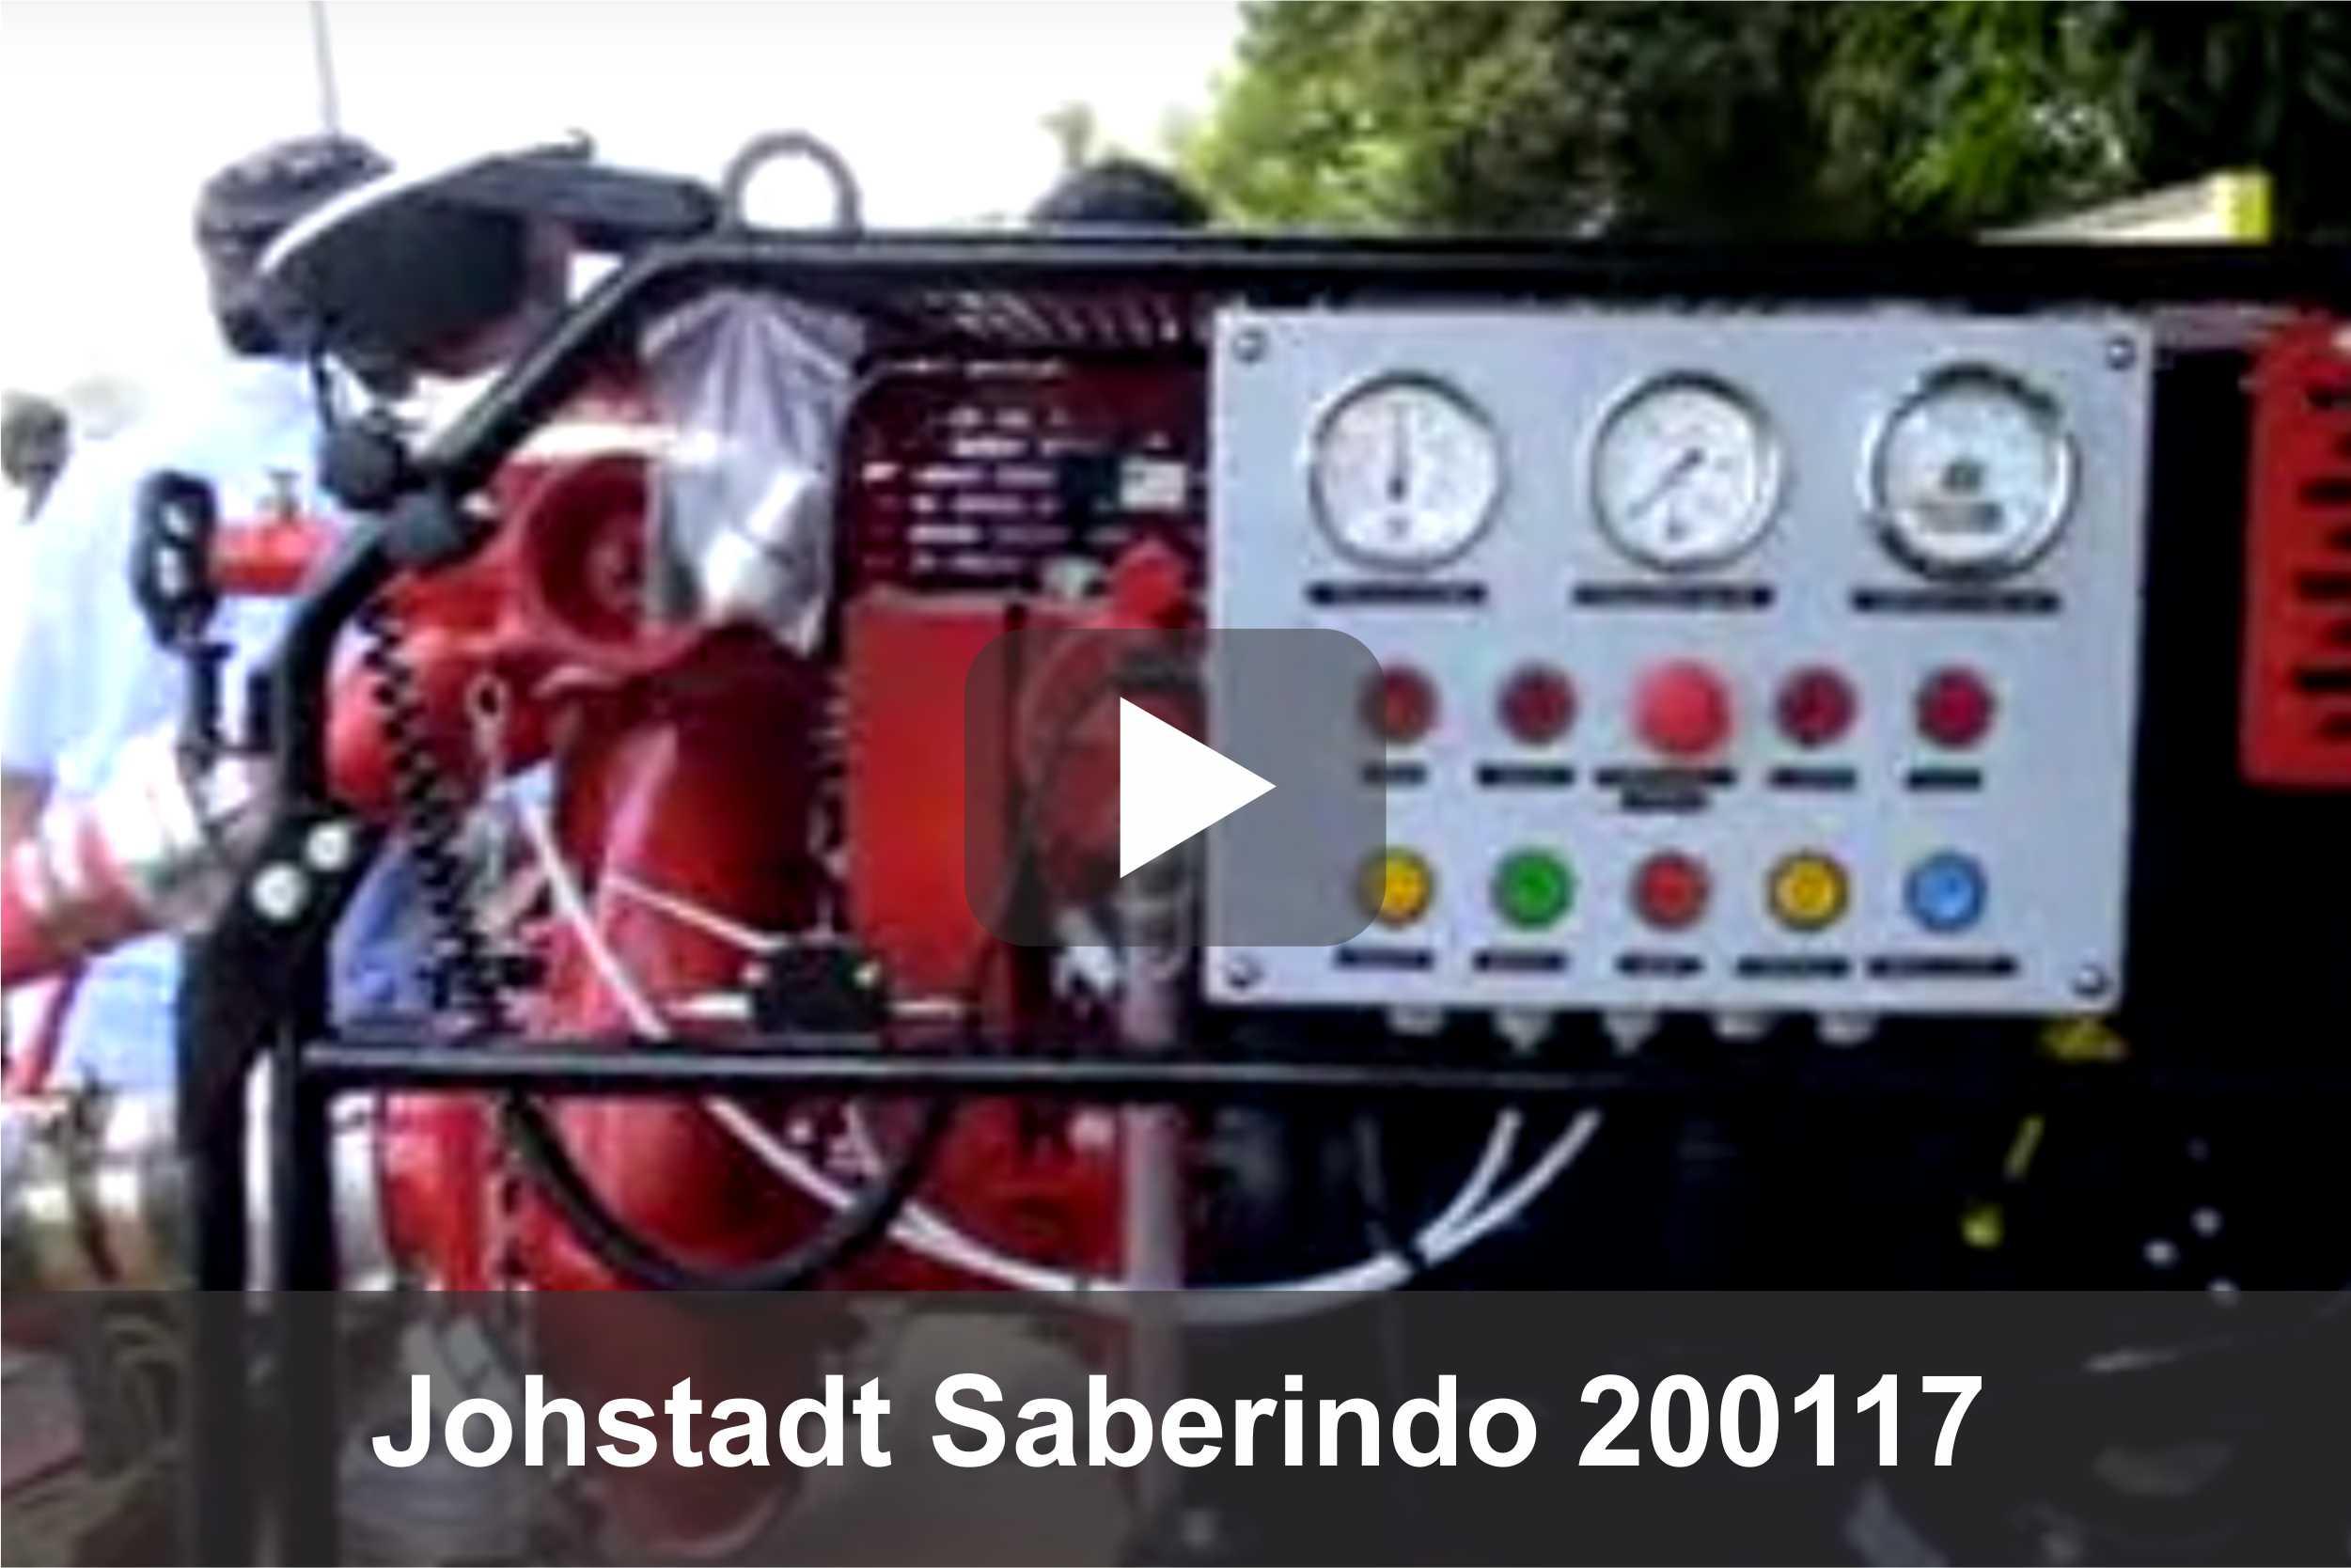 Johstadt Saberindo 200117 2